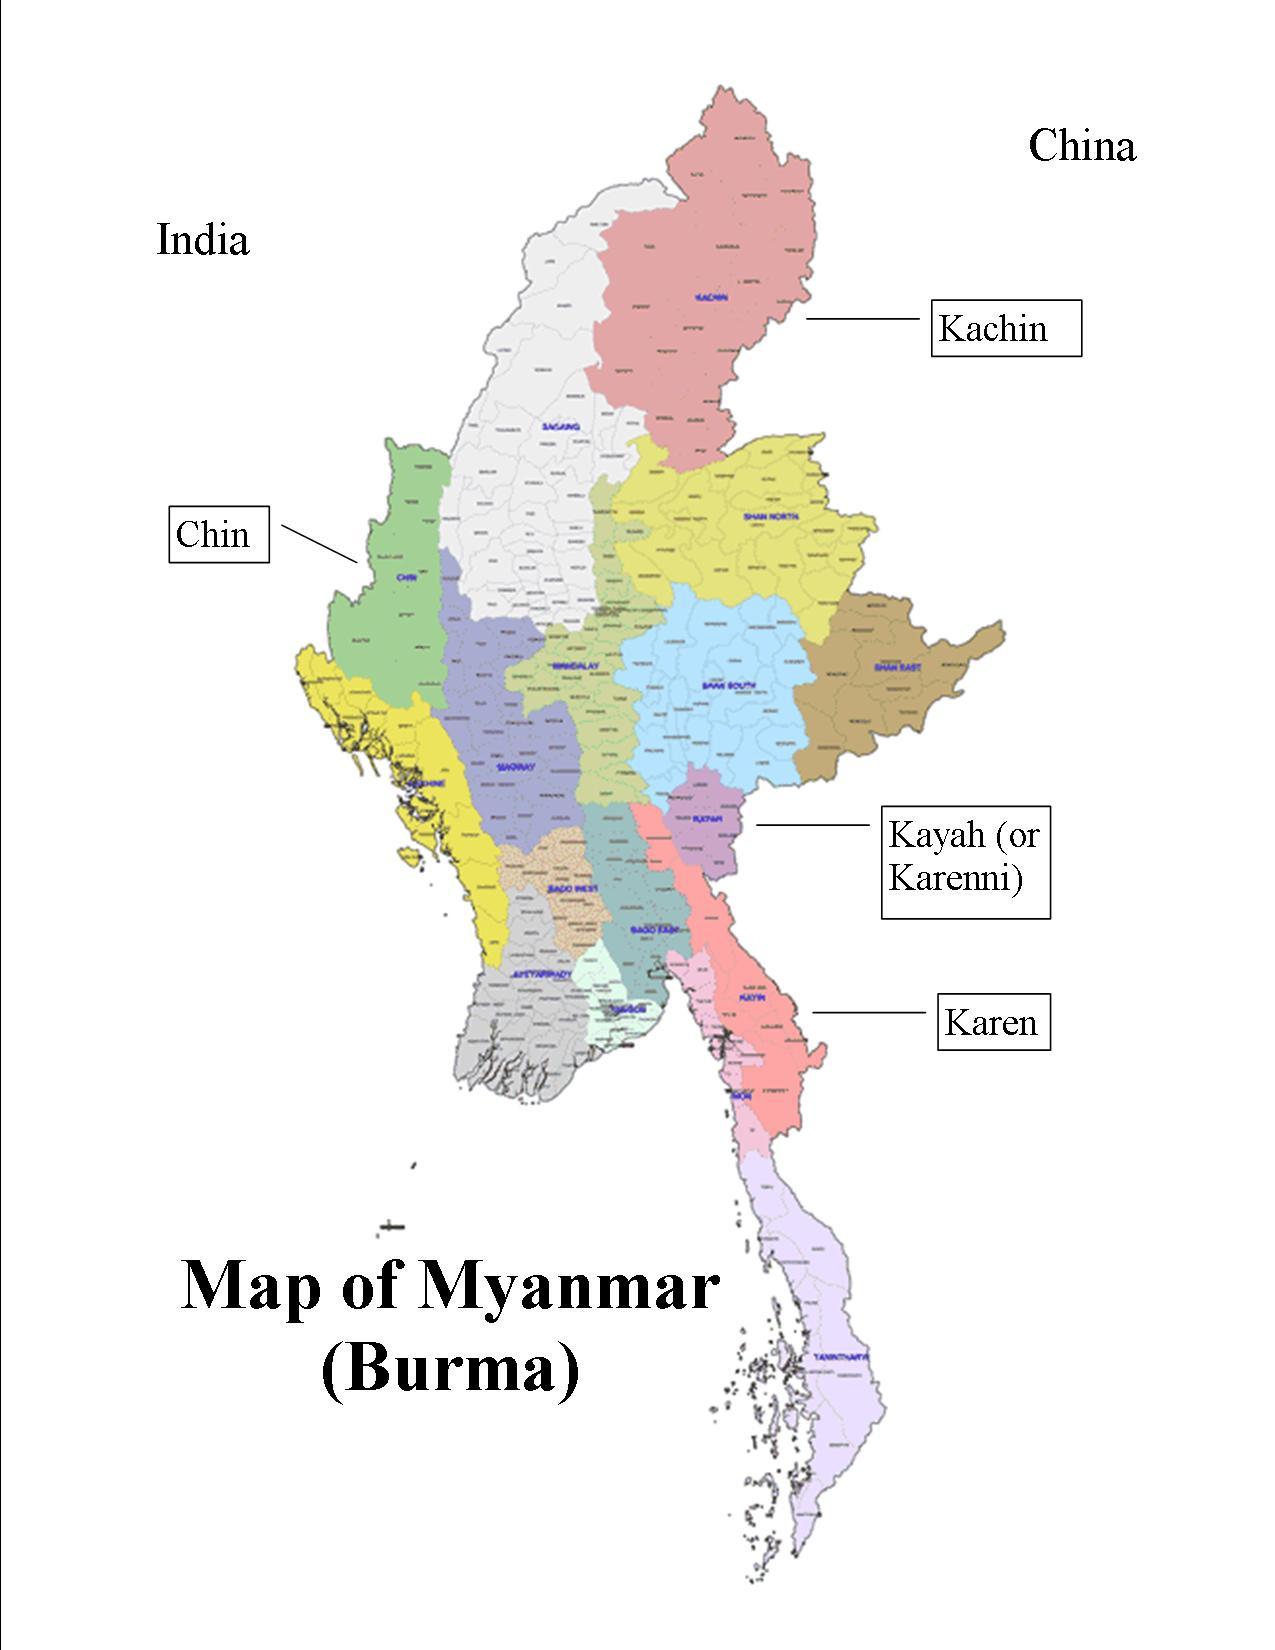 Maps Of Burma Johnmcmurphys Weblog - Map of burma